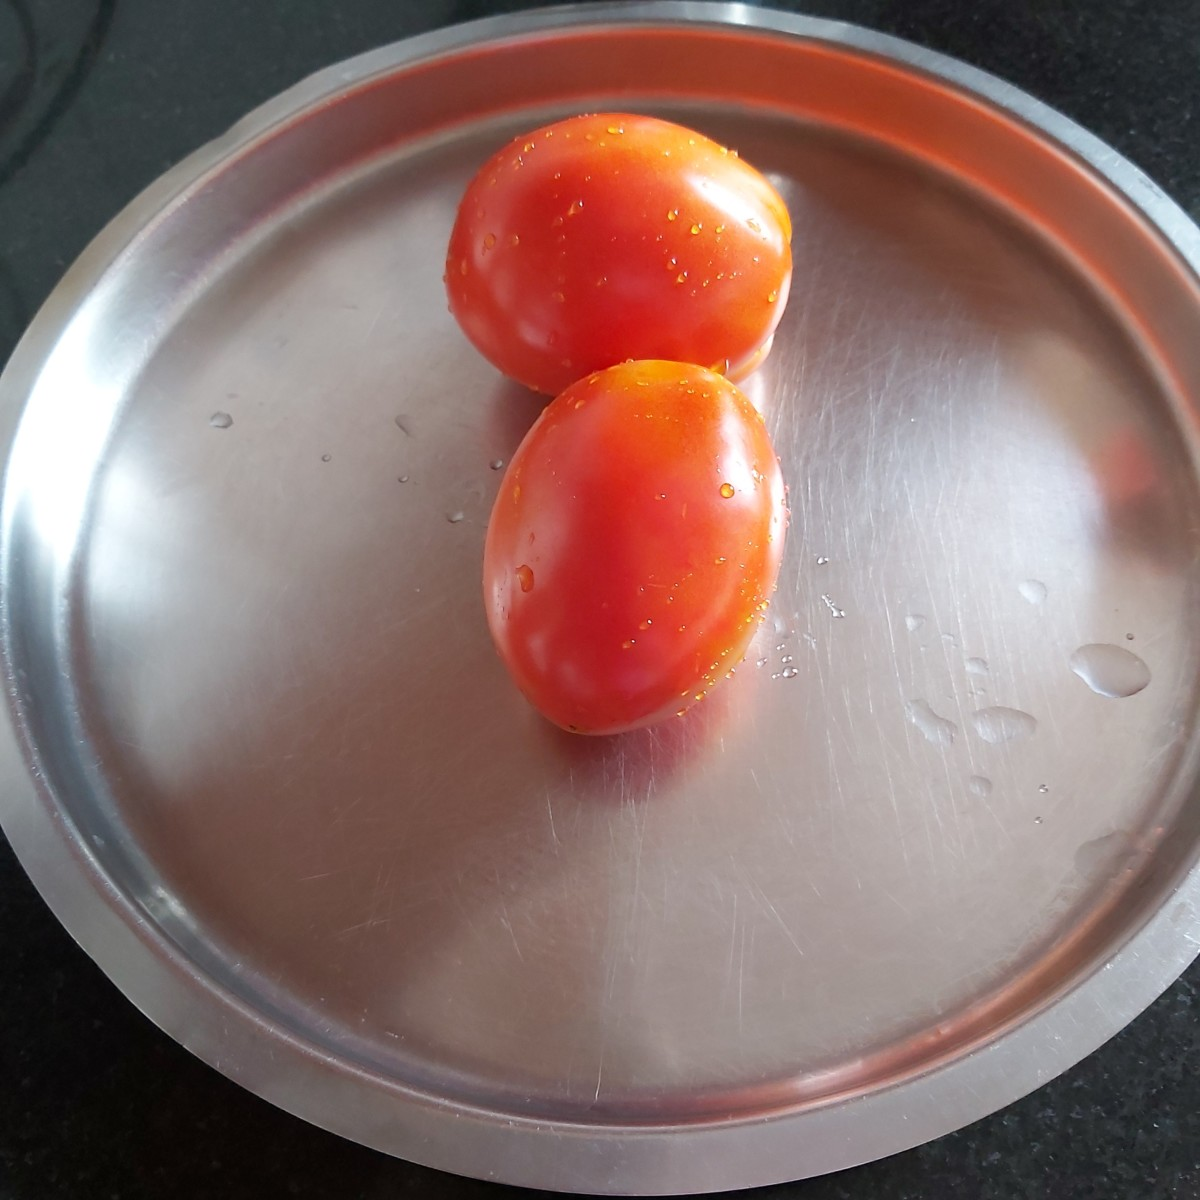 Wash 2-4 good quality ripe tomatoes.